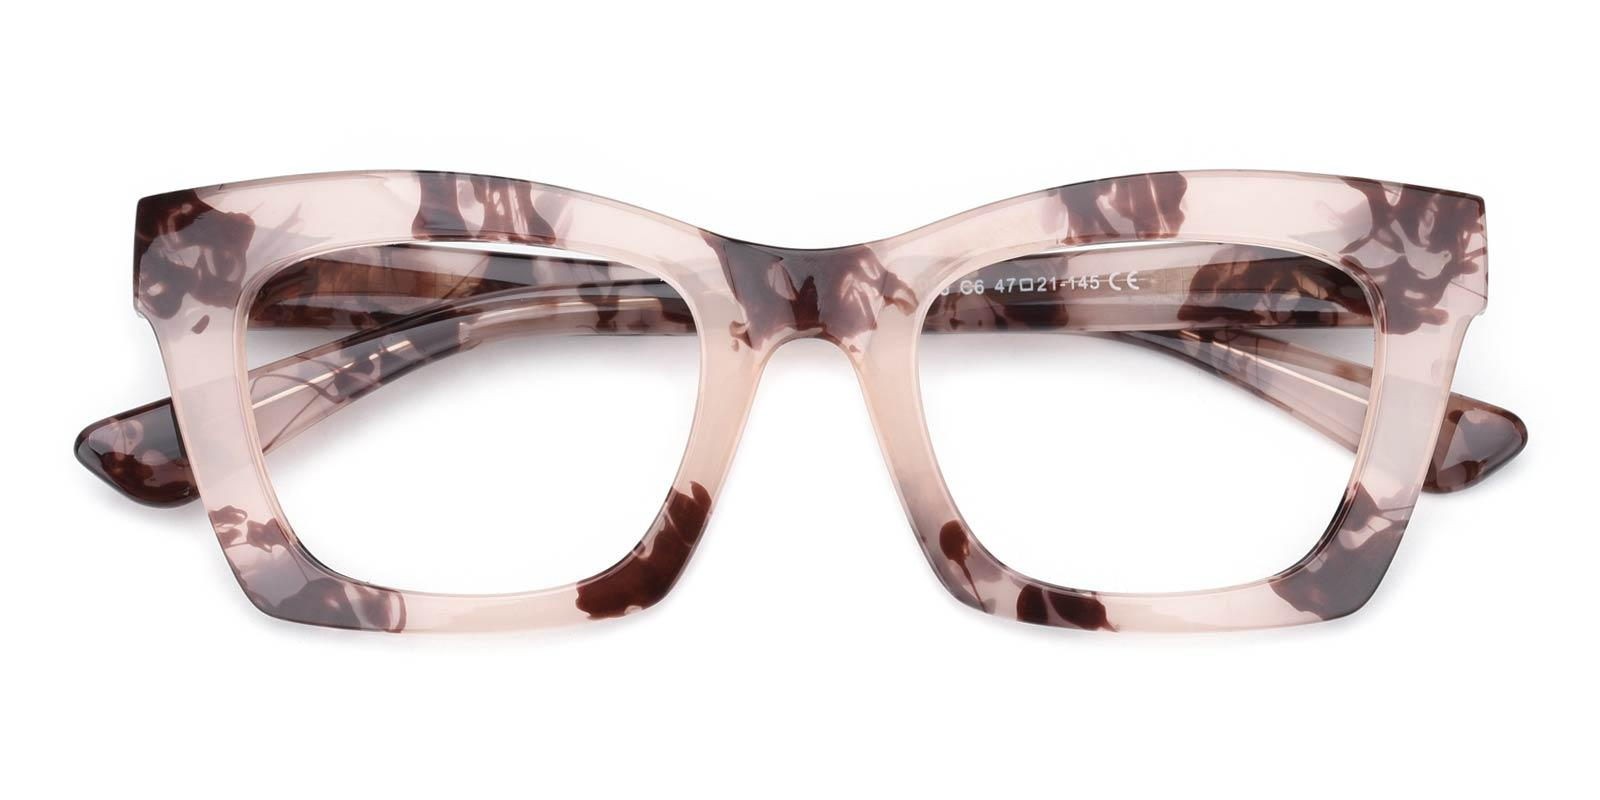 Catlady-Tortoise-Cat-Acetate-Eyeglasses-detail